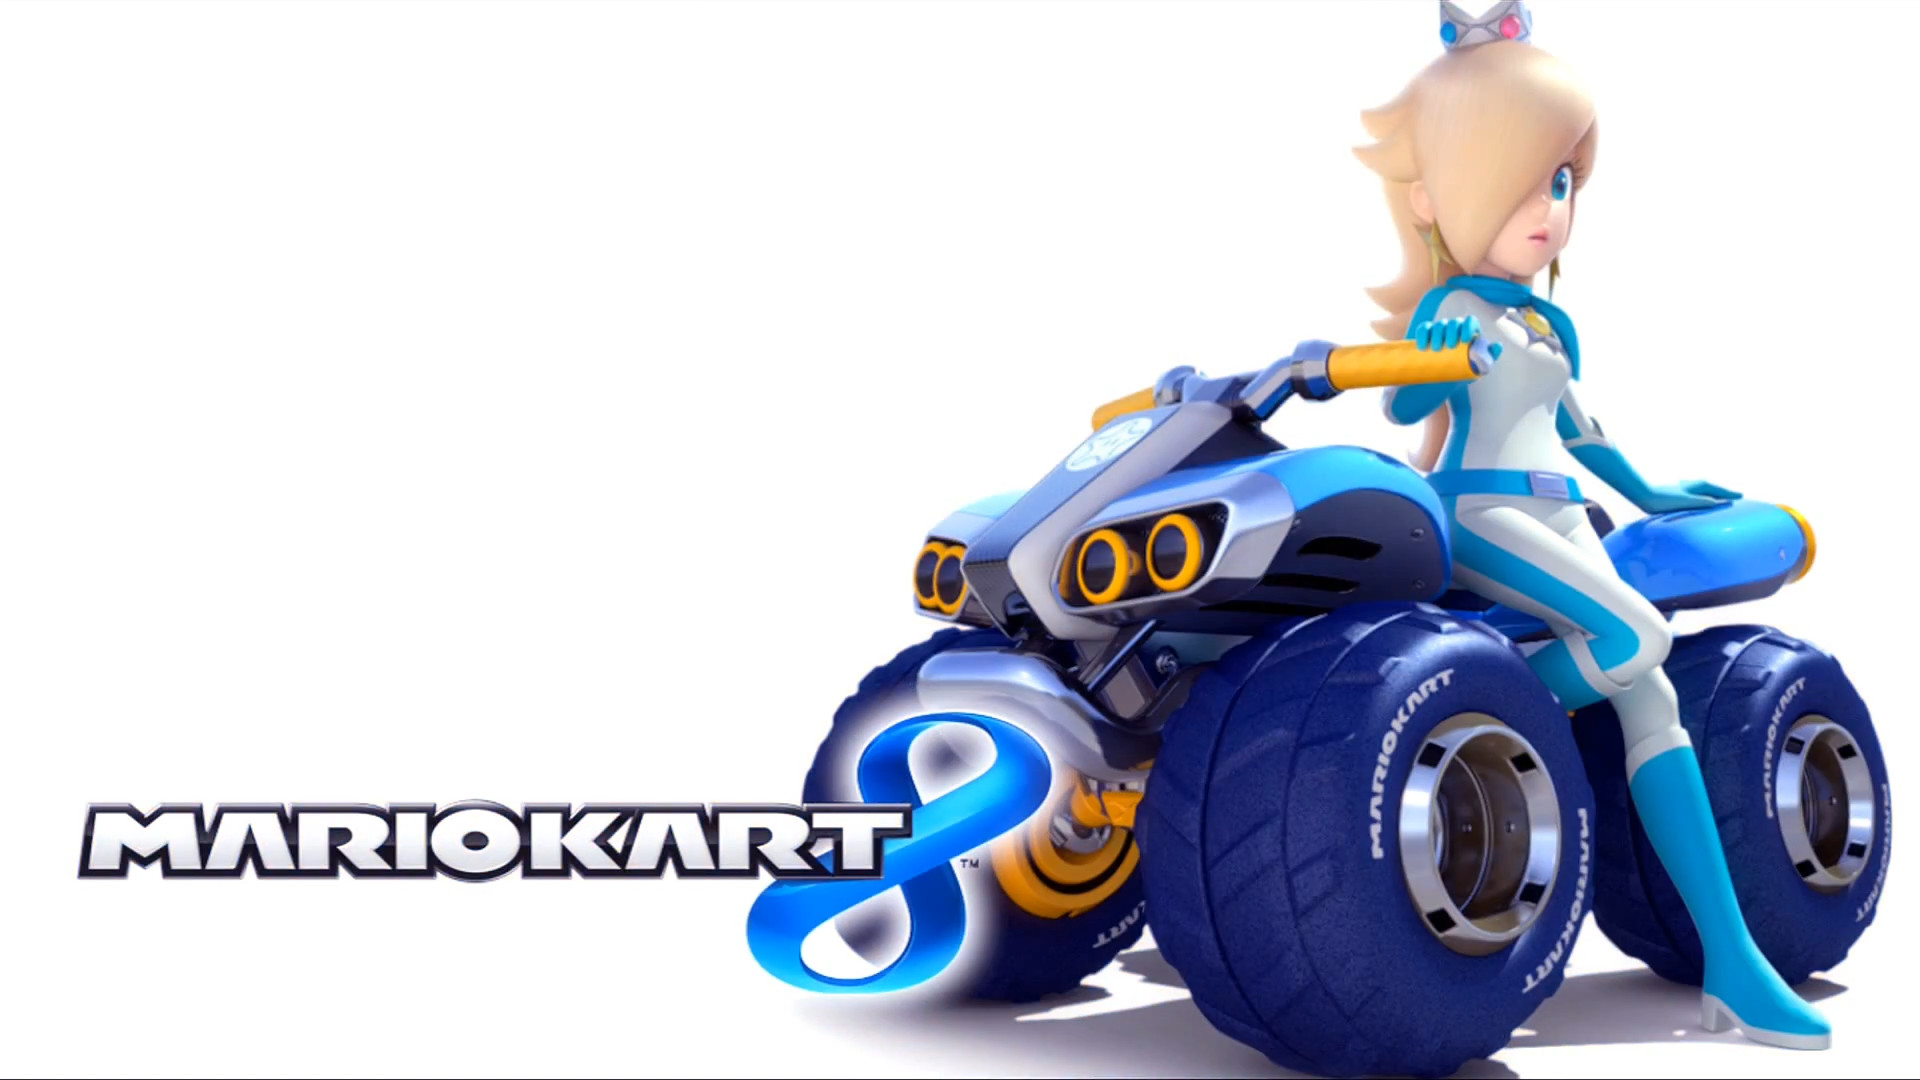 Mario Kart 8 Wallpaper: Mario Kart 8 Rosalina Wallpaper (76+ Images